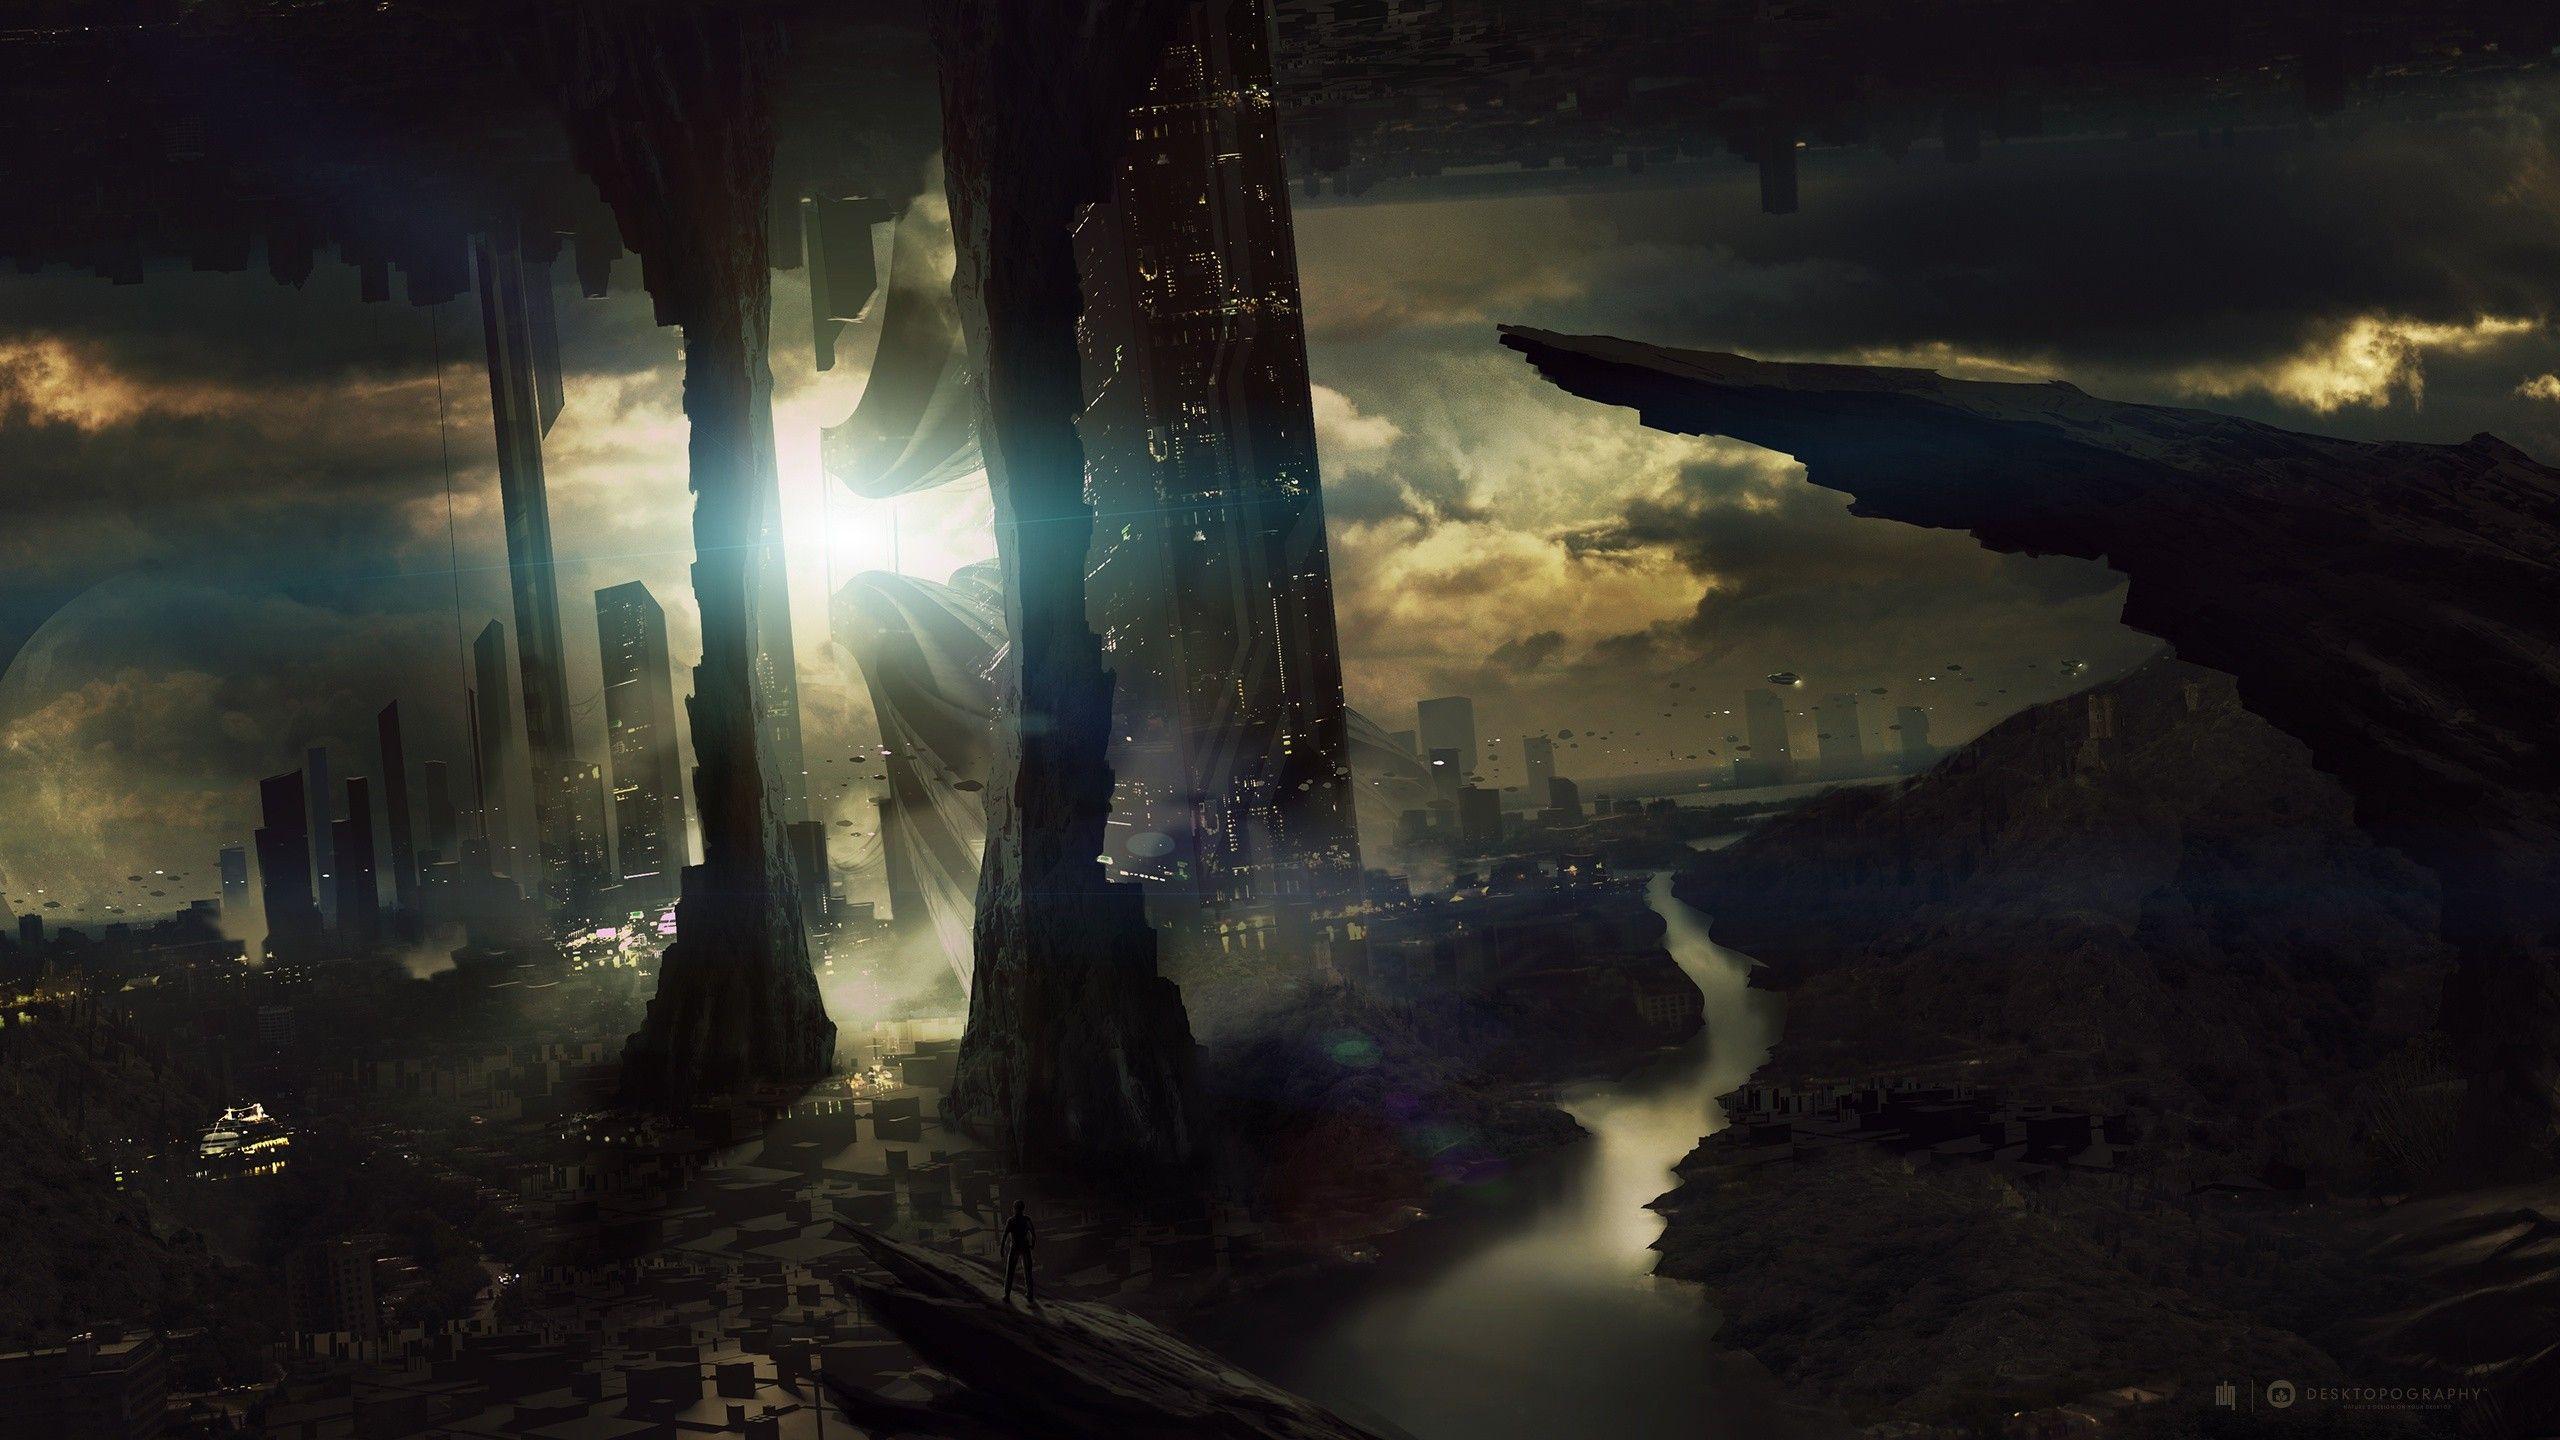 horizon digital art science fiction Desktopography cities  / 2560x1440 Wallpaper